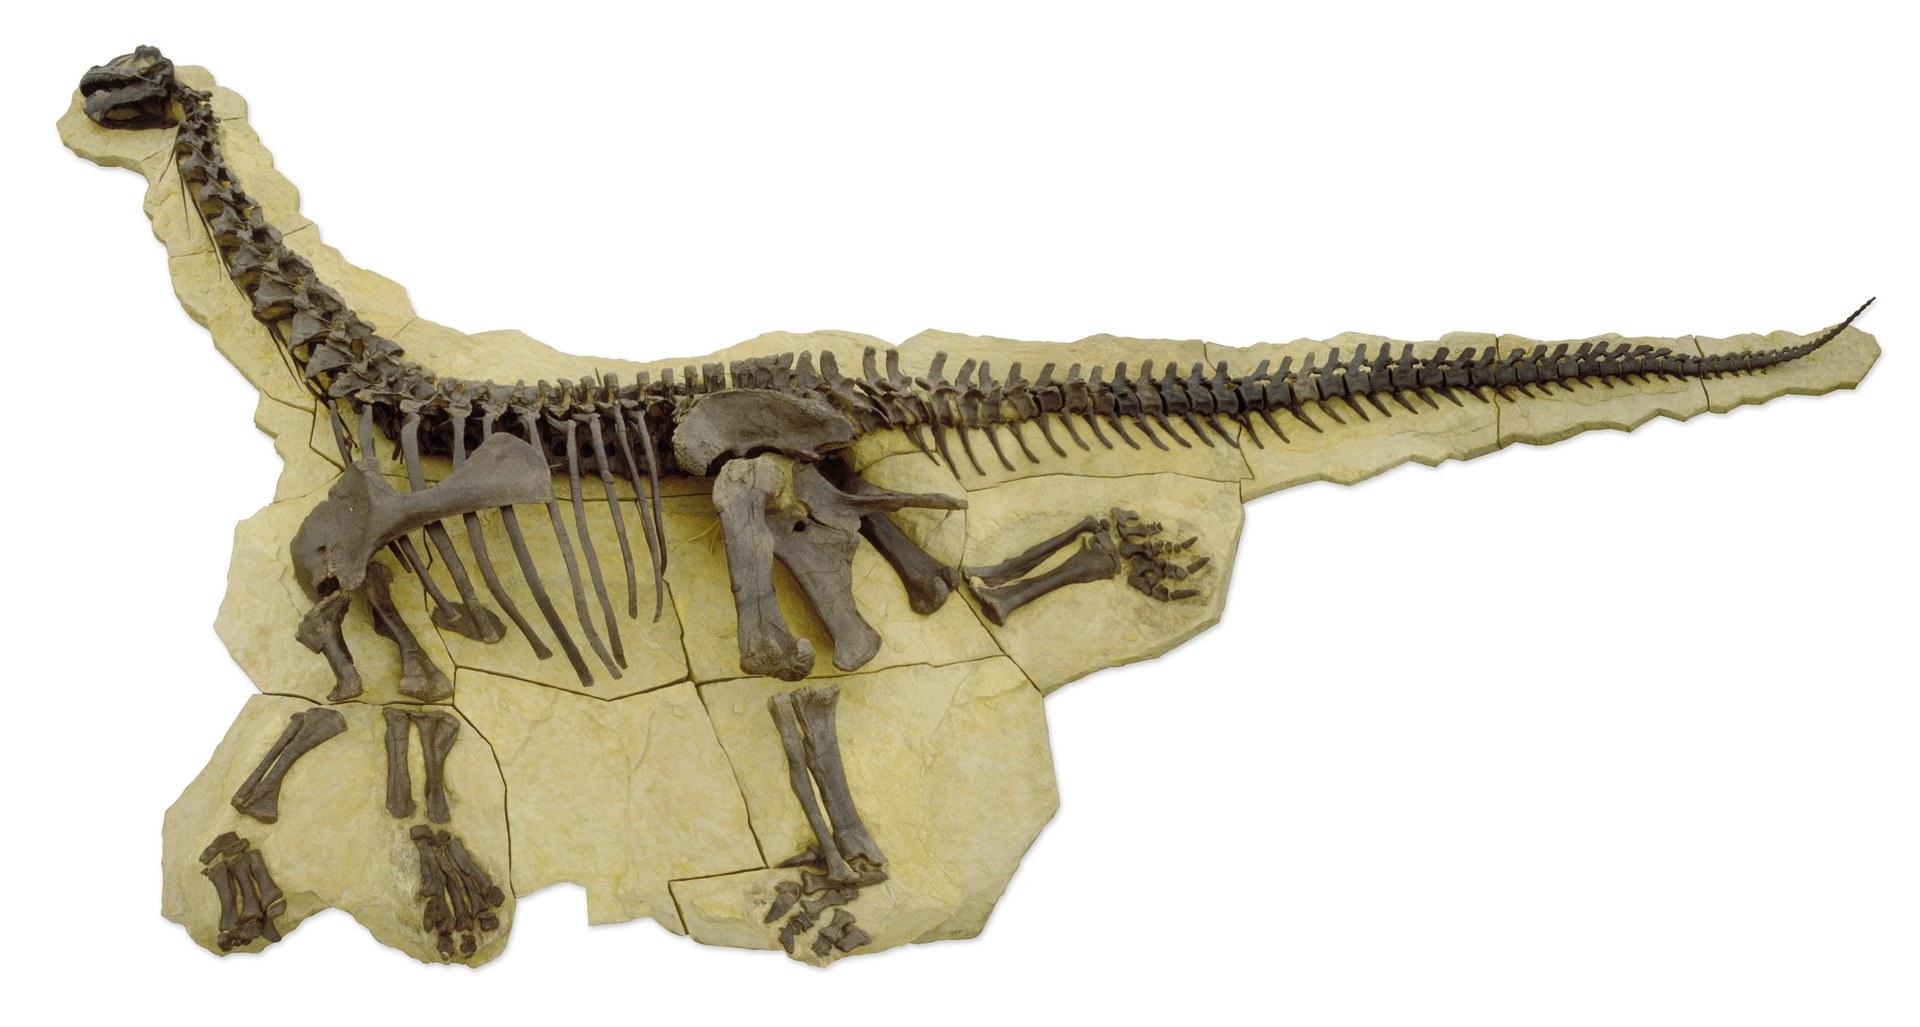 Das Dinosaurierskelett